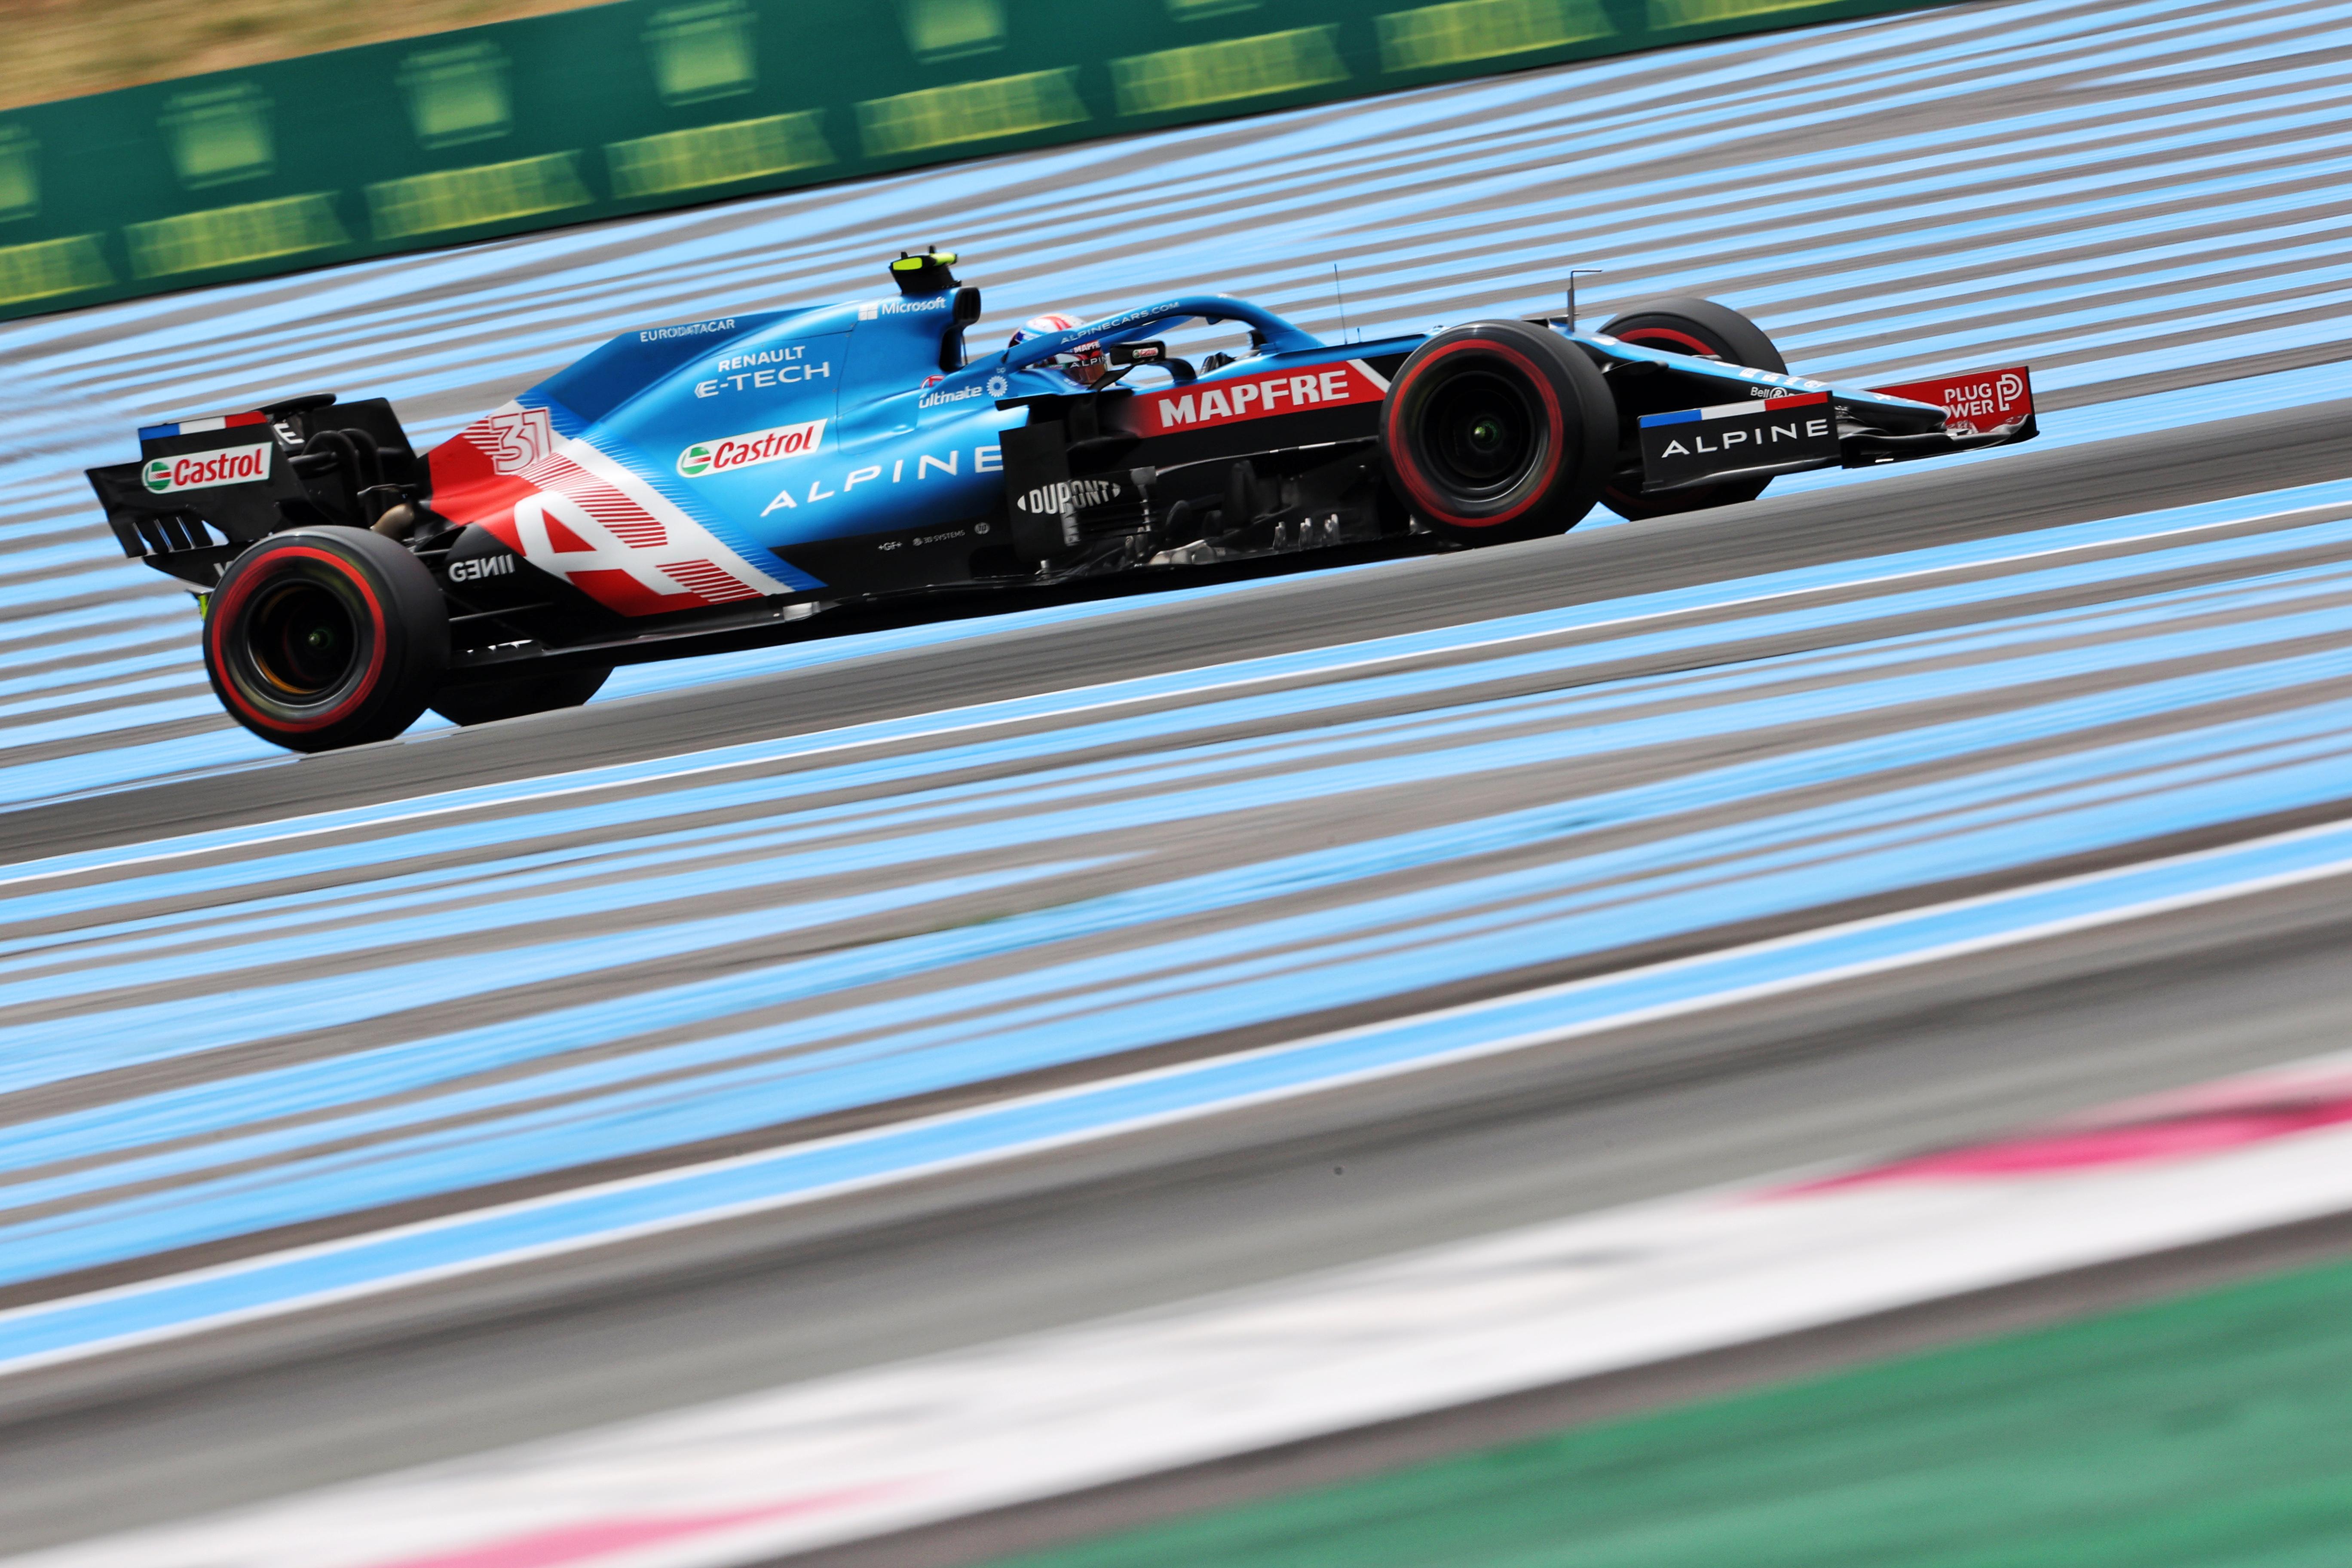 Motor Racing Formula One World Championship French Grand Prix Qualifying Day Paul Ricard, France